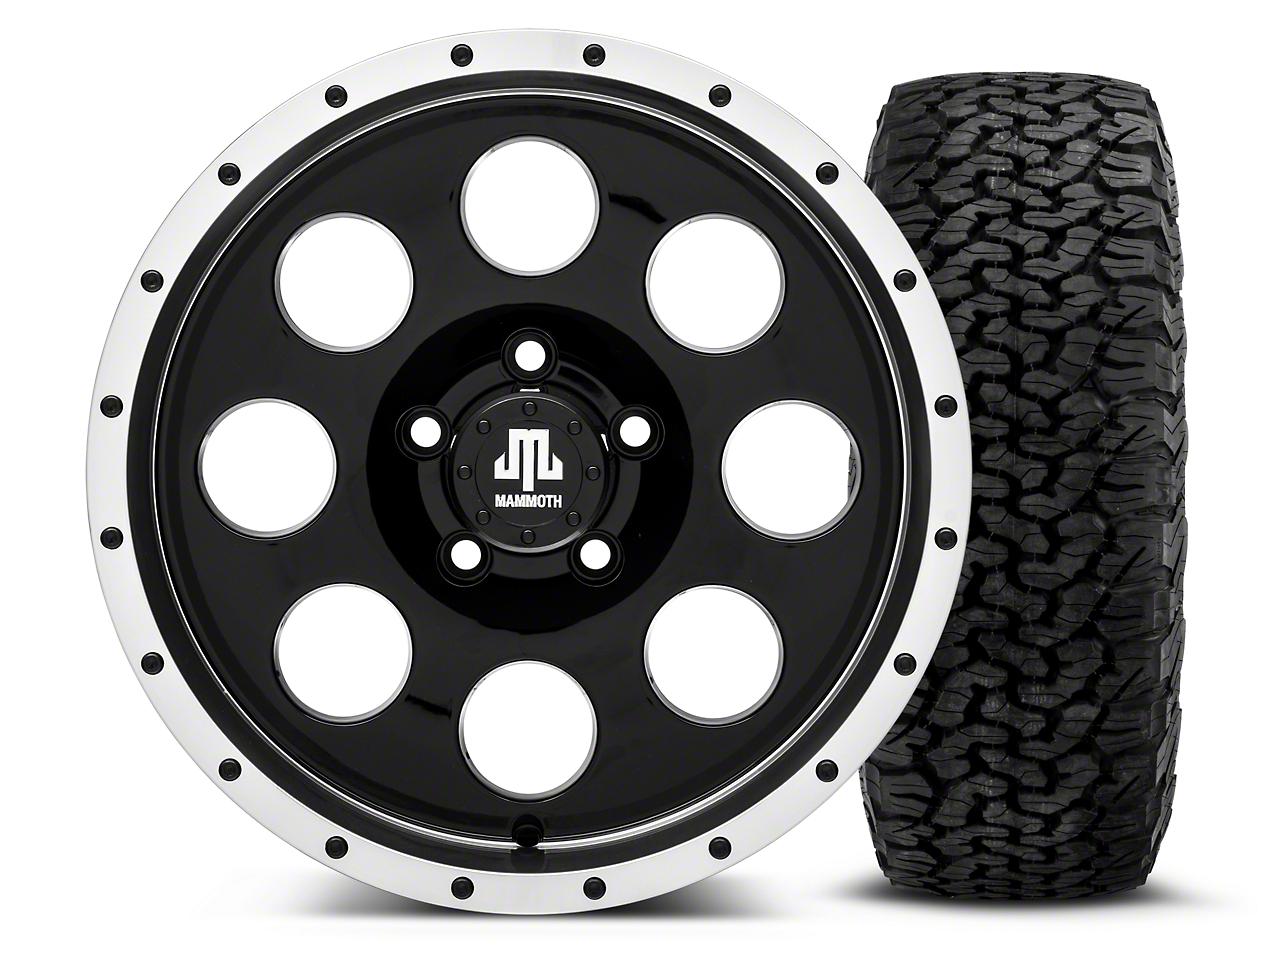 Mammoth 8 Beadlock Style Black 16x8 Wheel & BF Goodrich All Terrain TA KO2 305/70R16 Tire Kit (87-06 Jeep Wrangler YJ & TJ)